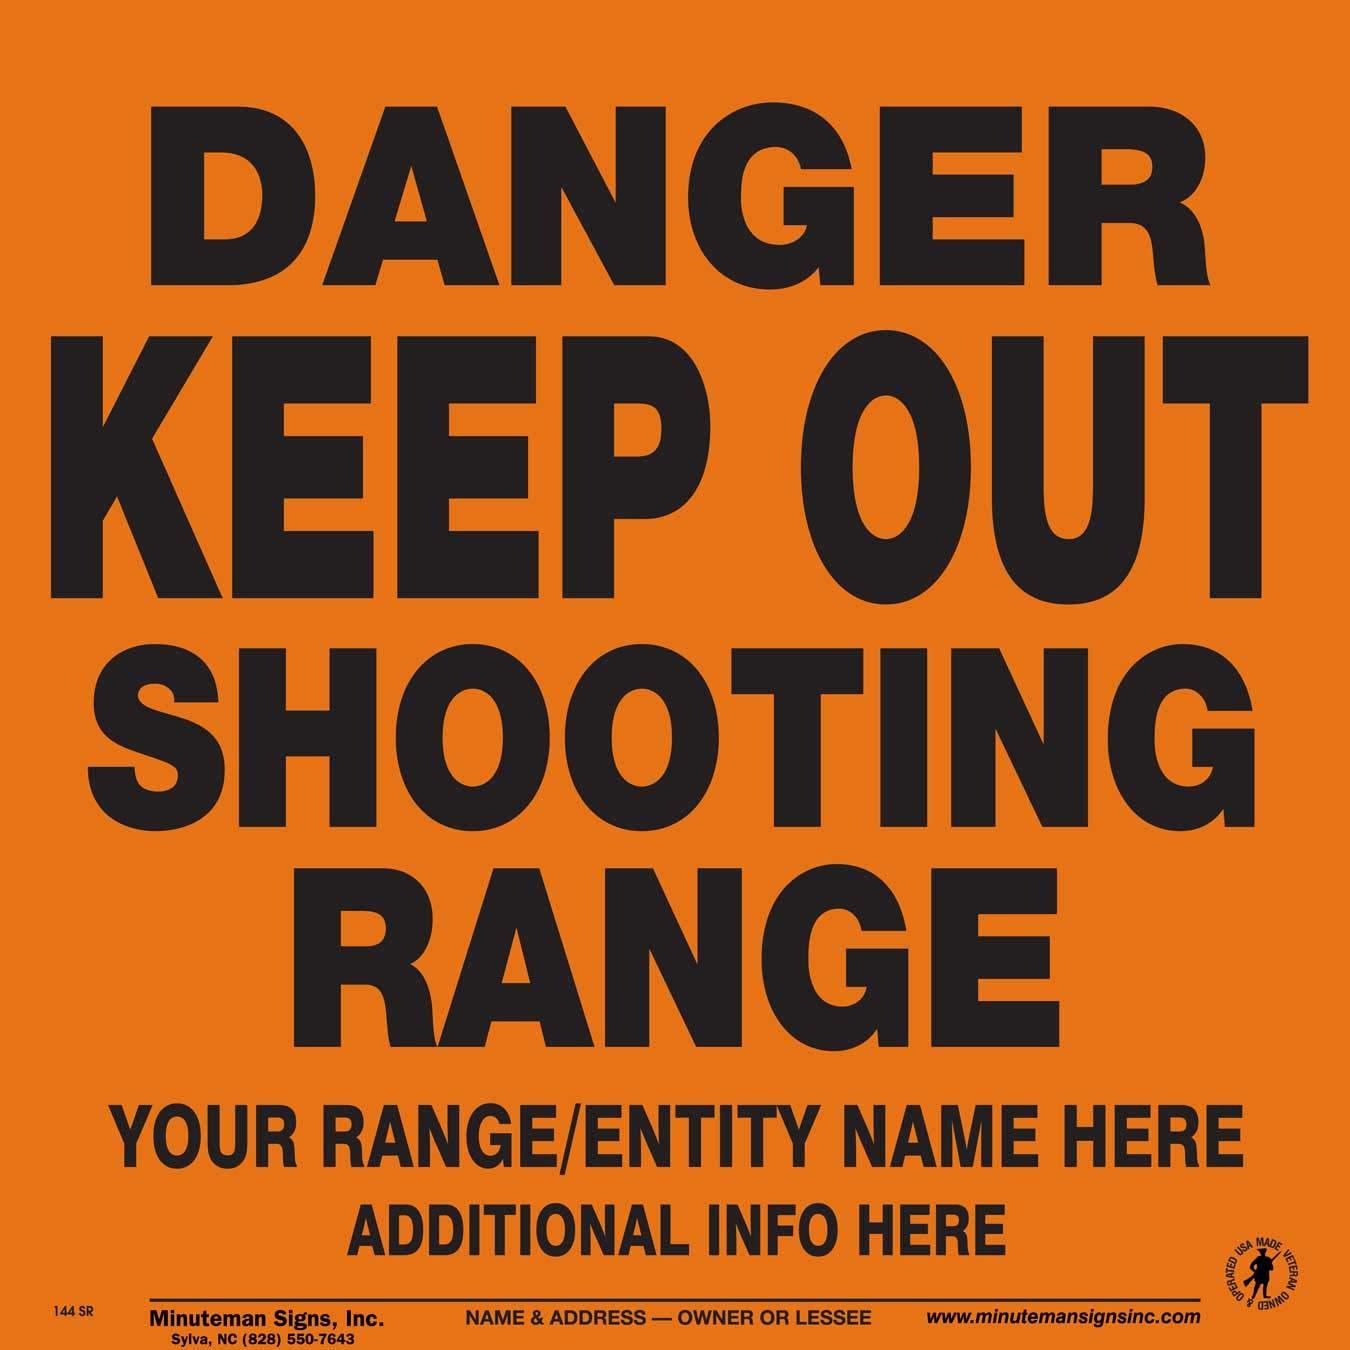 Minuteman Signs Customized Danger Keep Out Shooting Range Aluminum Sign x25 (Orange)